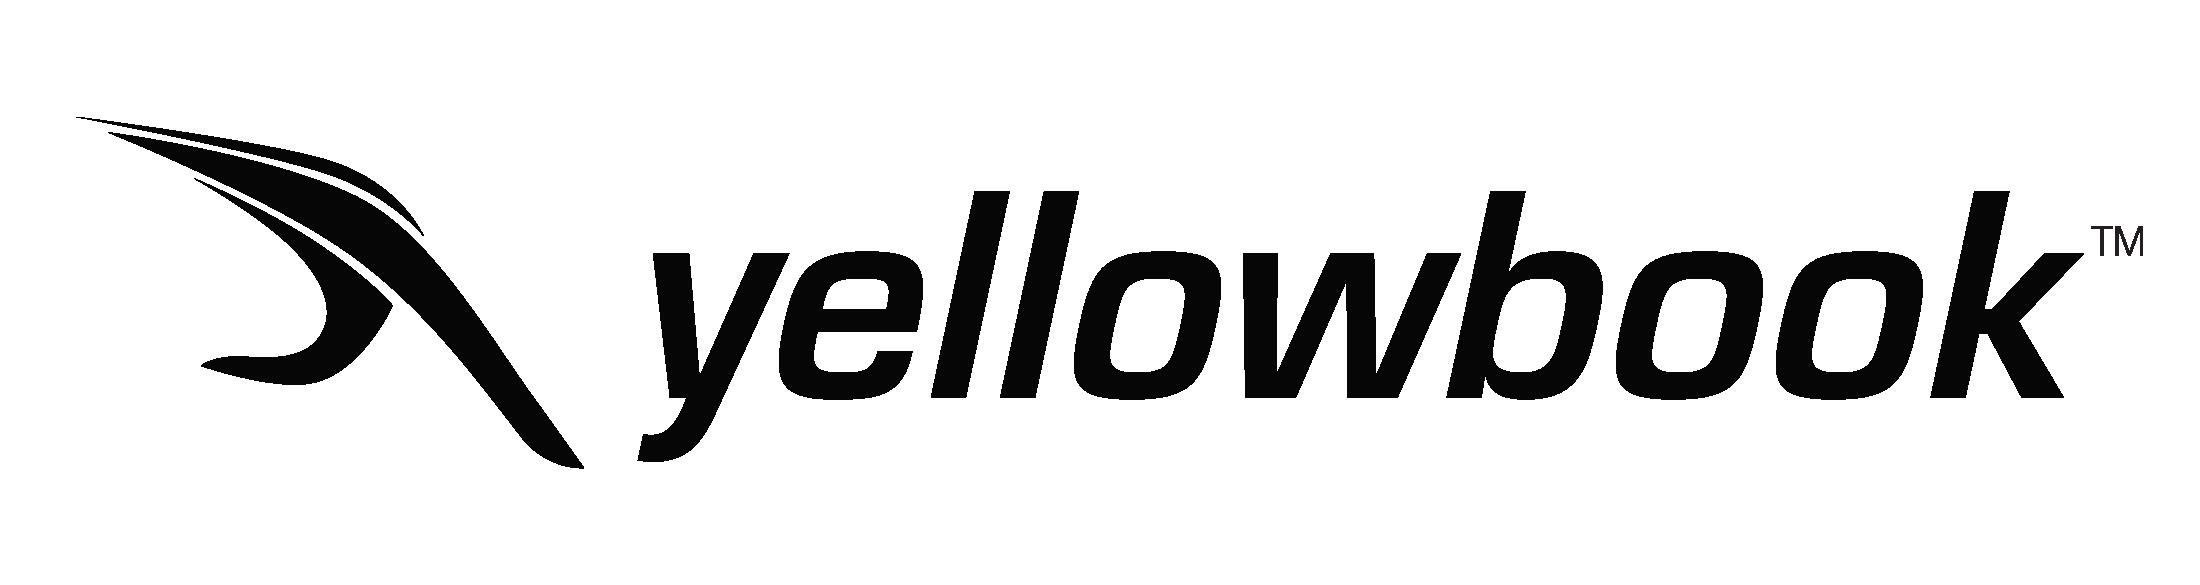 Yellowbook-Logo